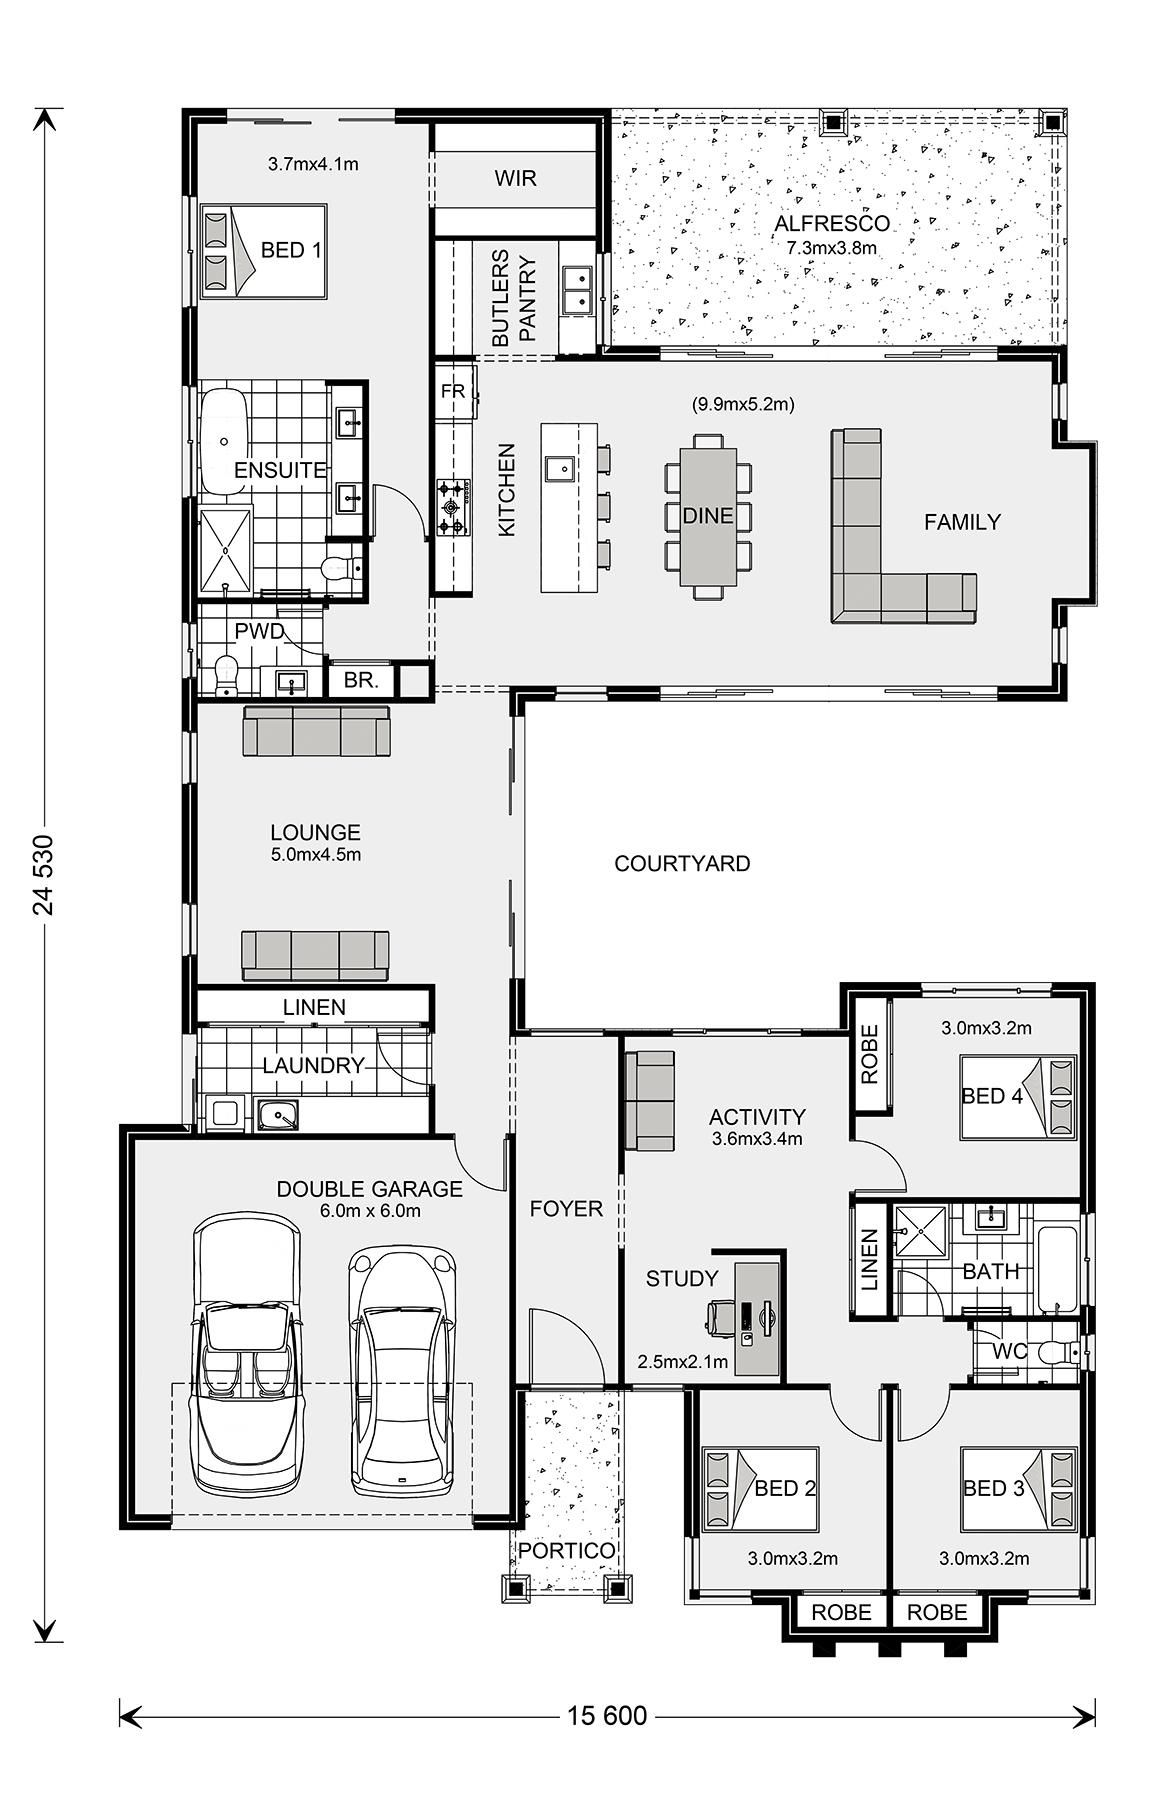 Mandalay 335 Home Designs In Newcastle G J Gardner Homes Home Design Floor Plans Dream House Plans New House Plans